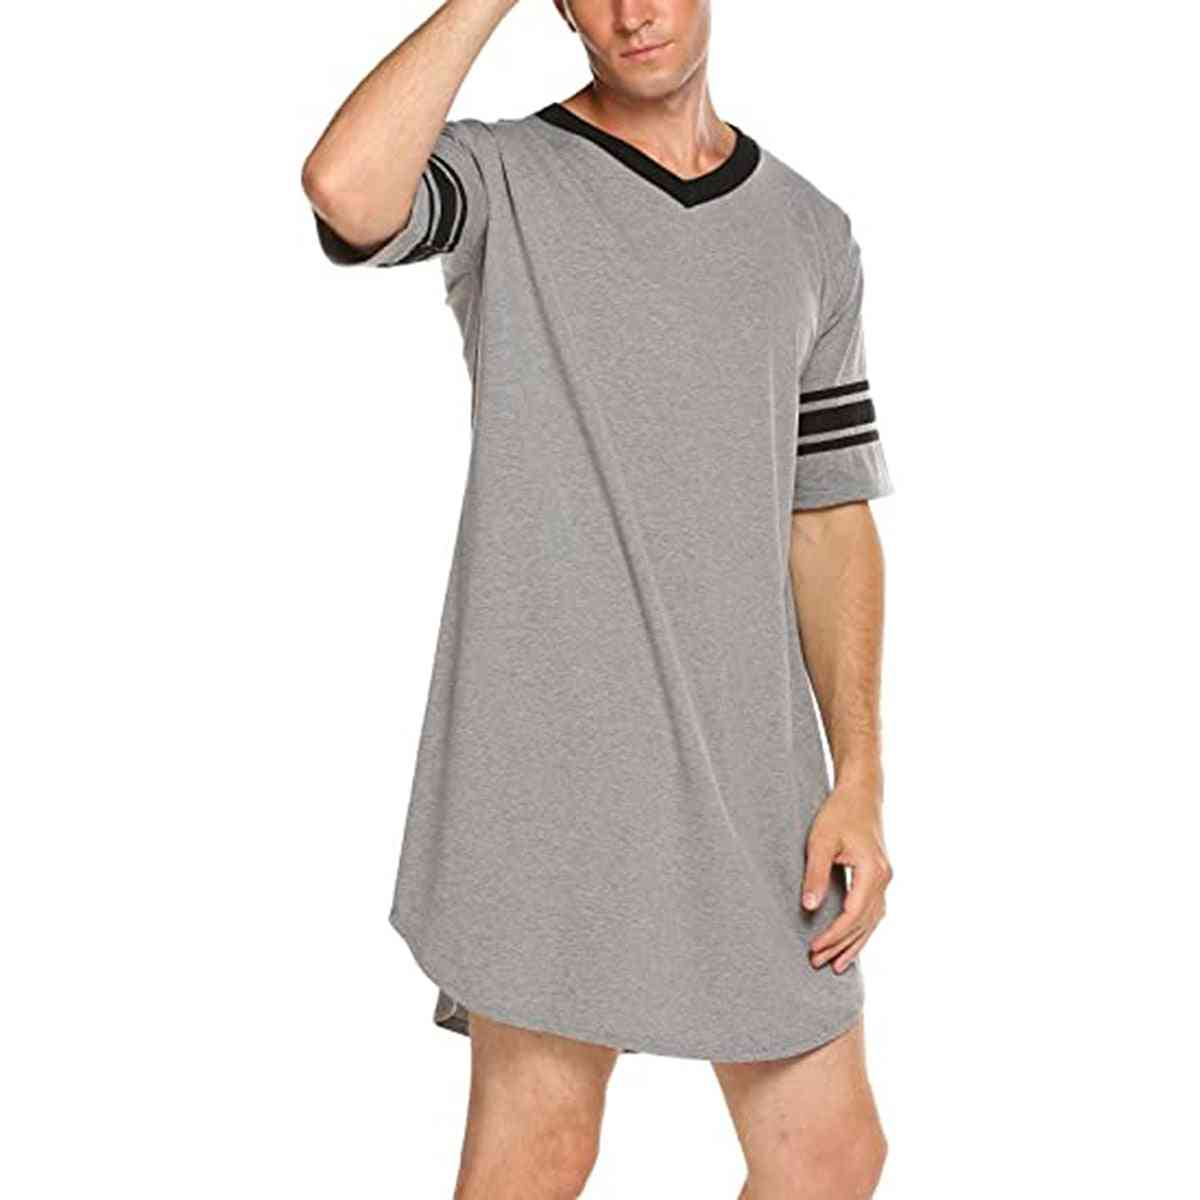 Men Cotton Nightshirt, Short Sleeve, V-neck, Loose Sleepwear T-shirt